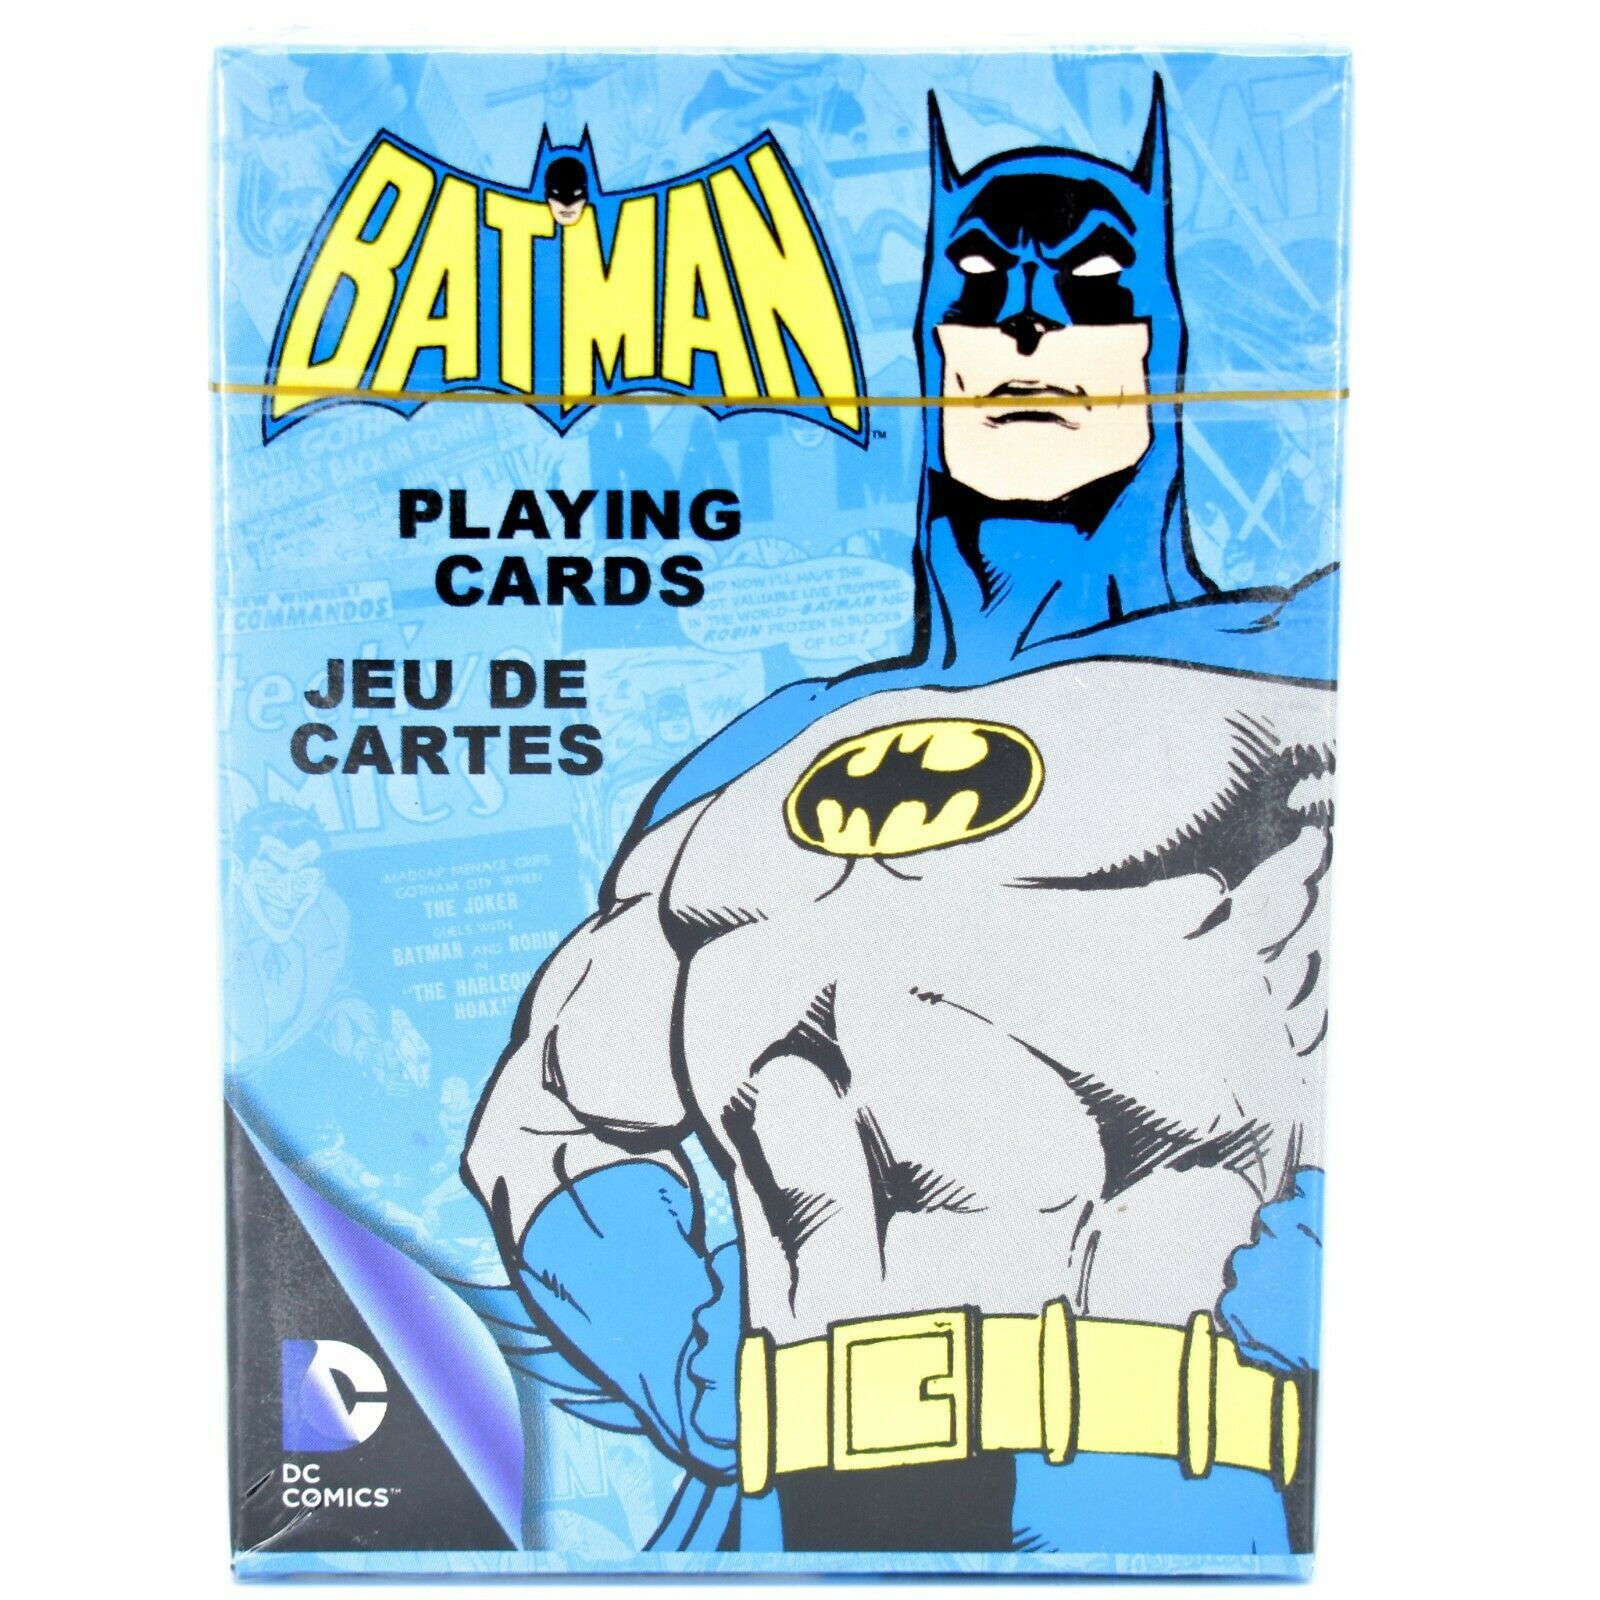 Aquarius DC Comics Retro Batman Themed Playing Cards Deck